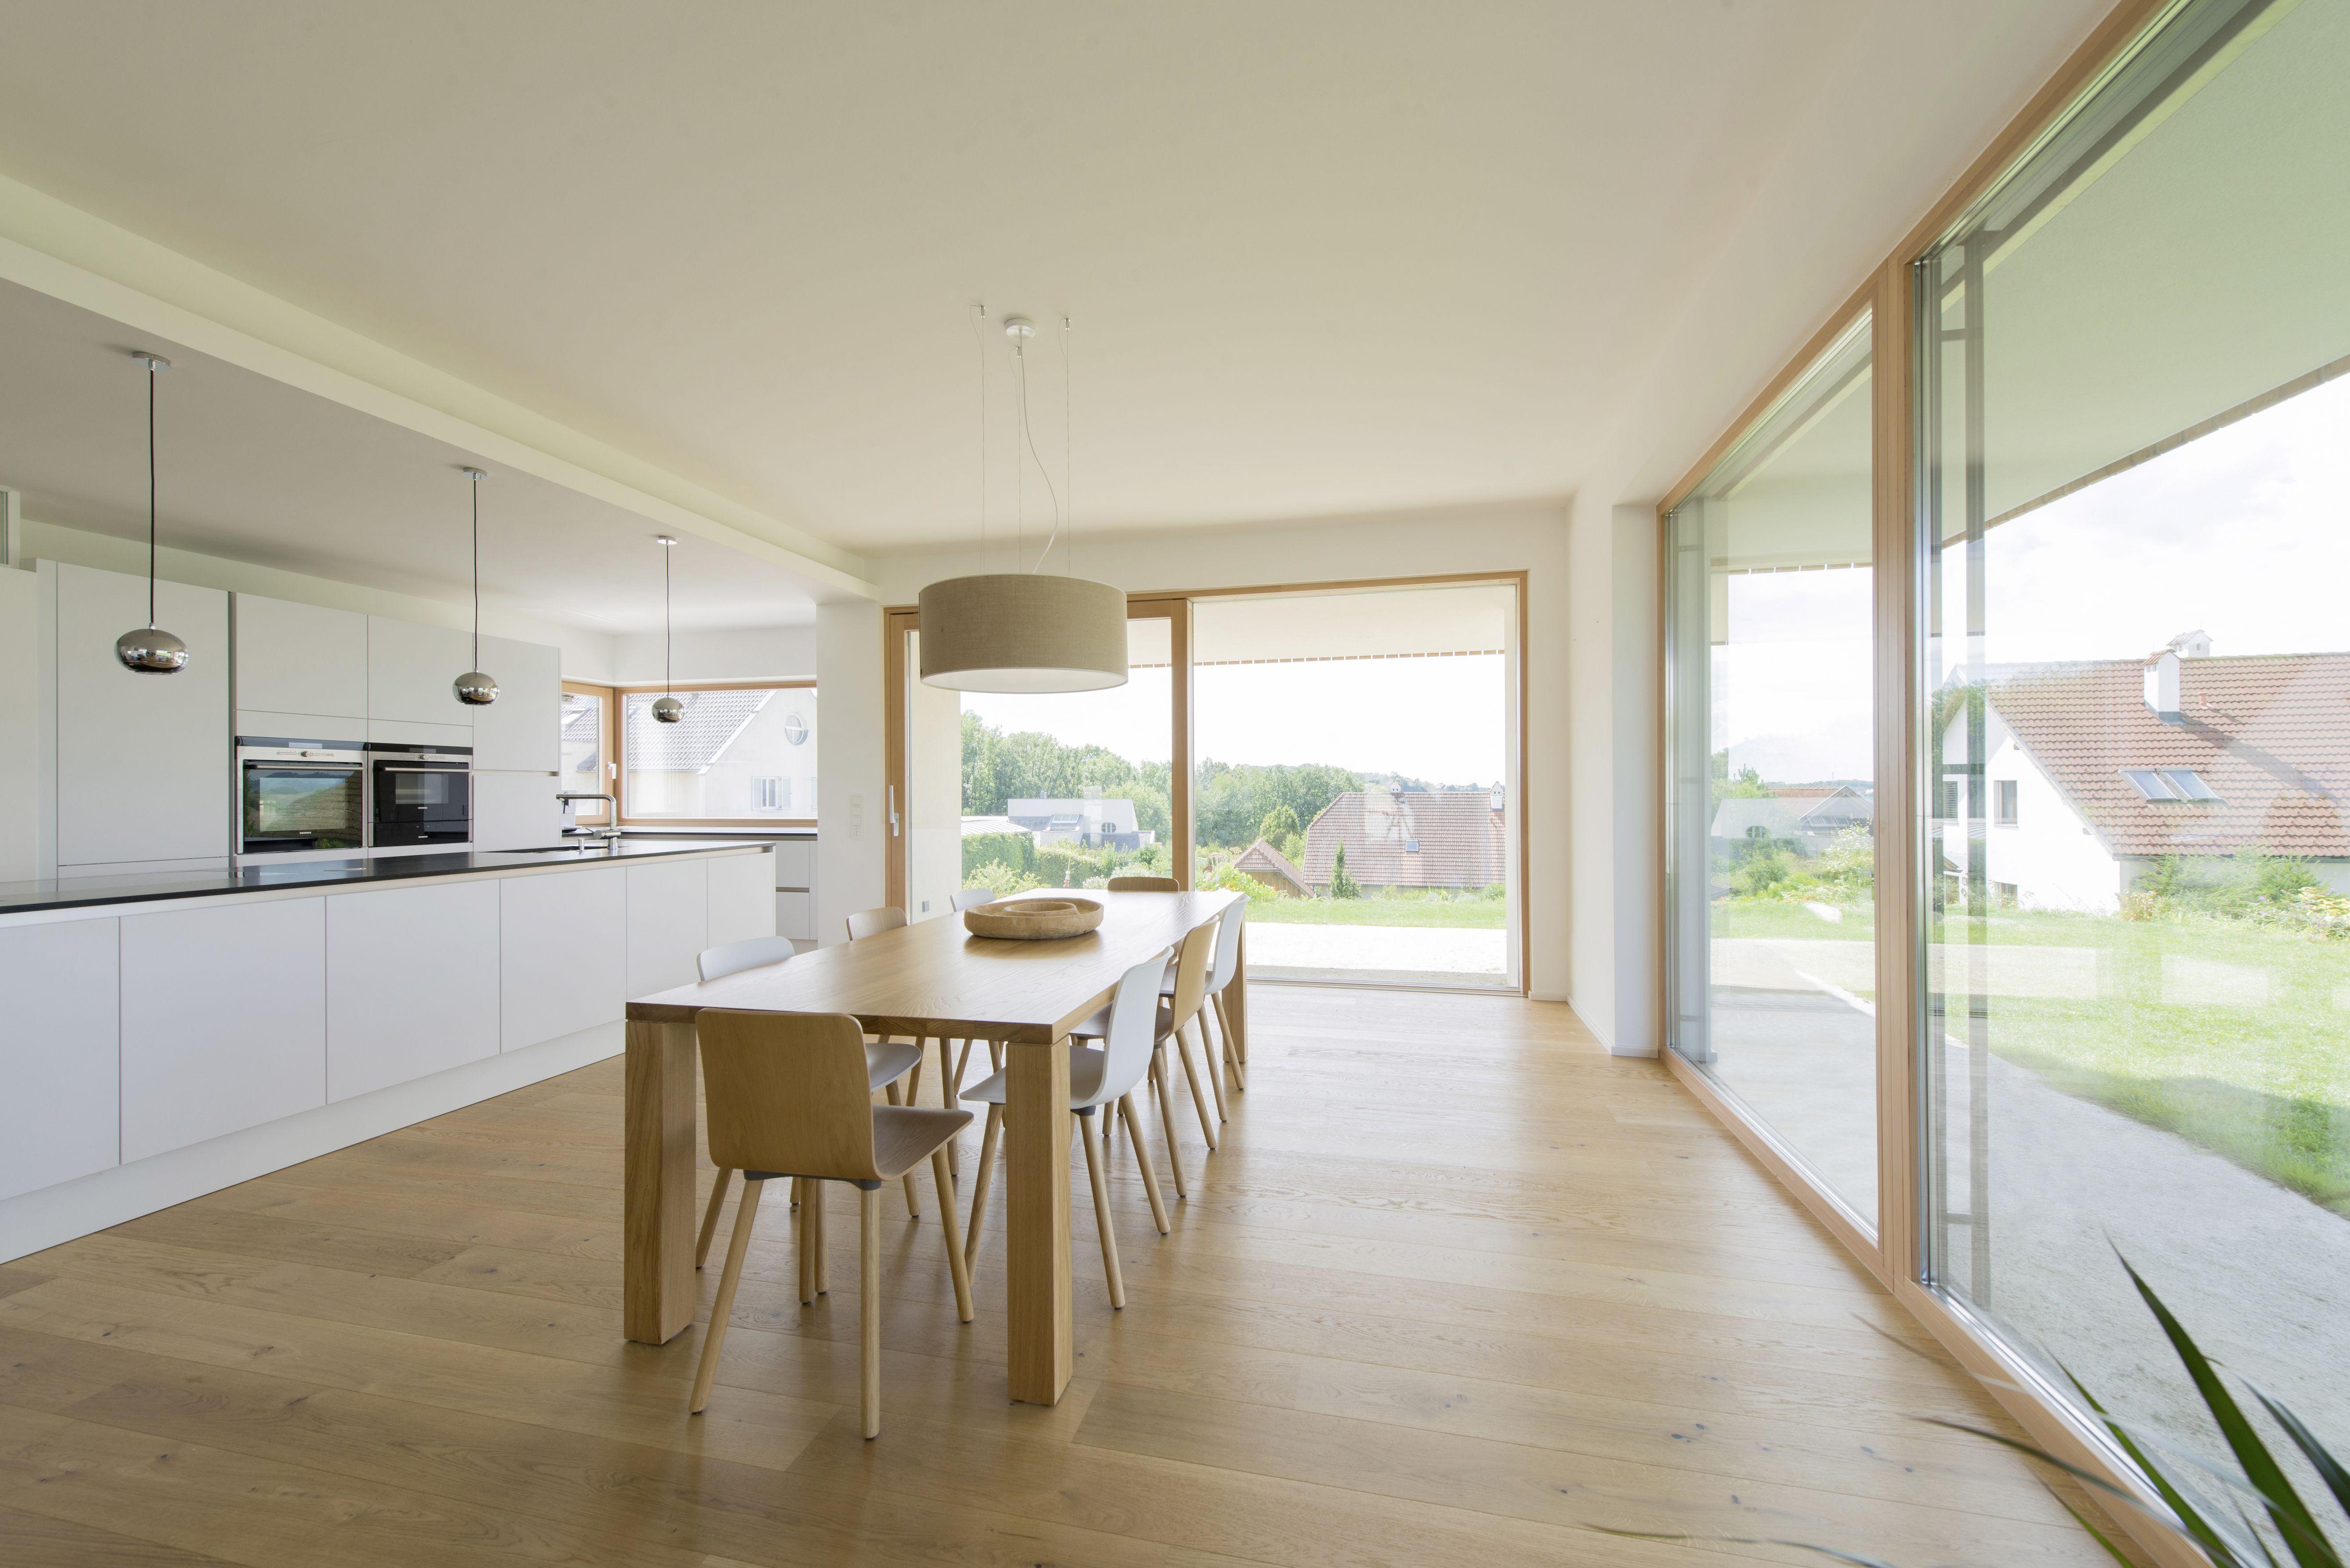 e of Internorm s design styles Home pure Bright rooms to liven